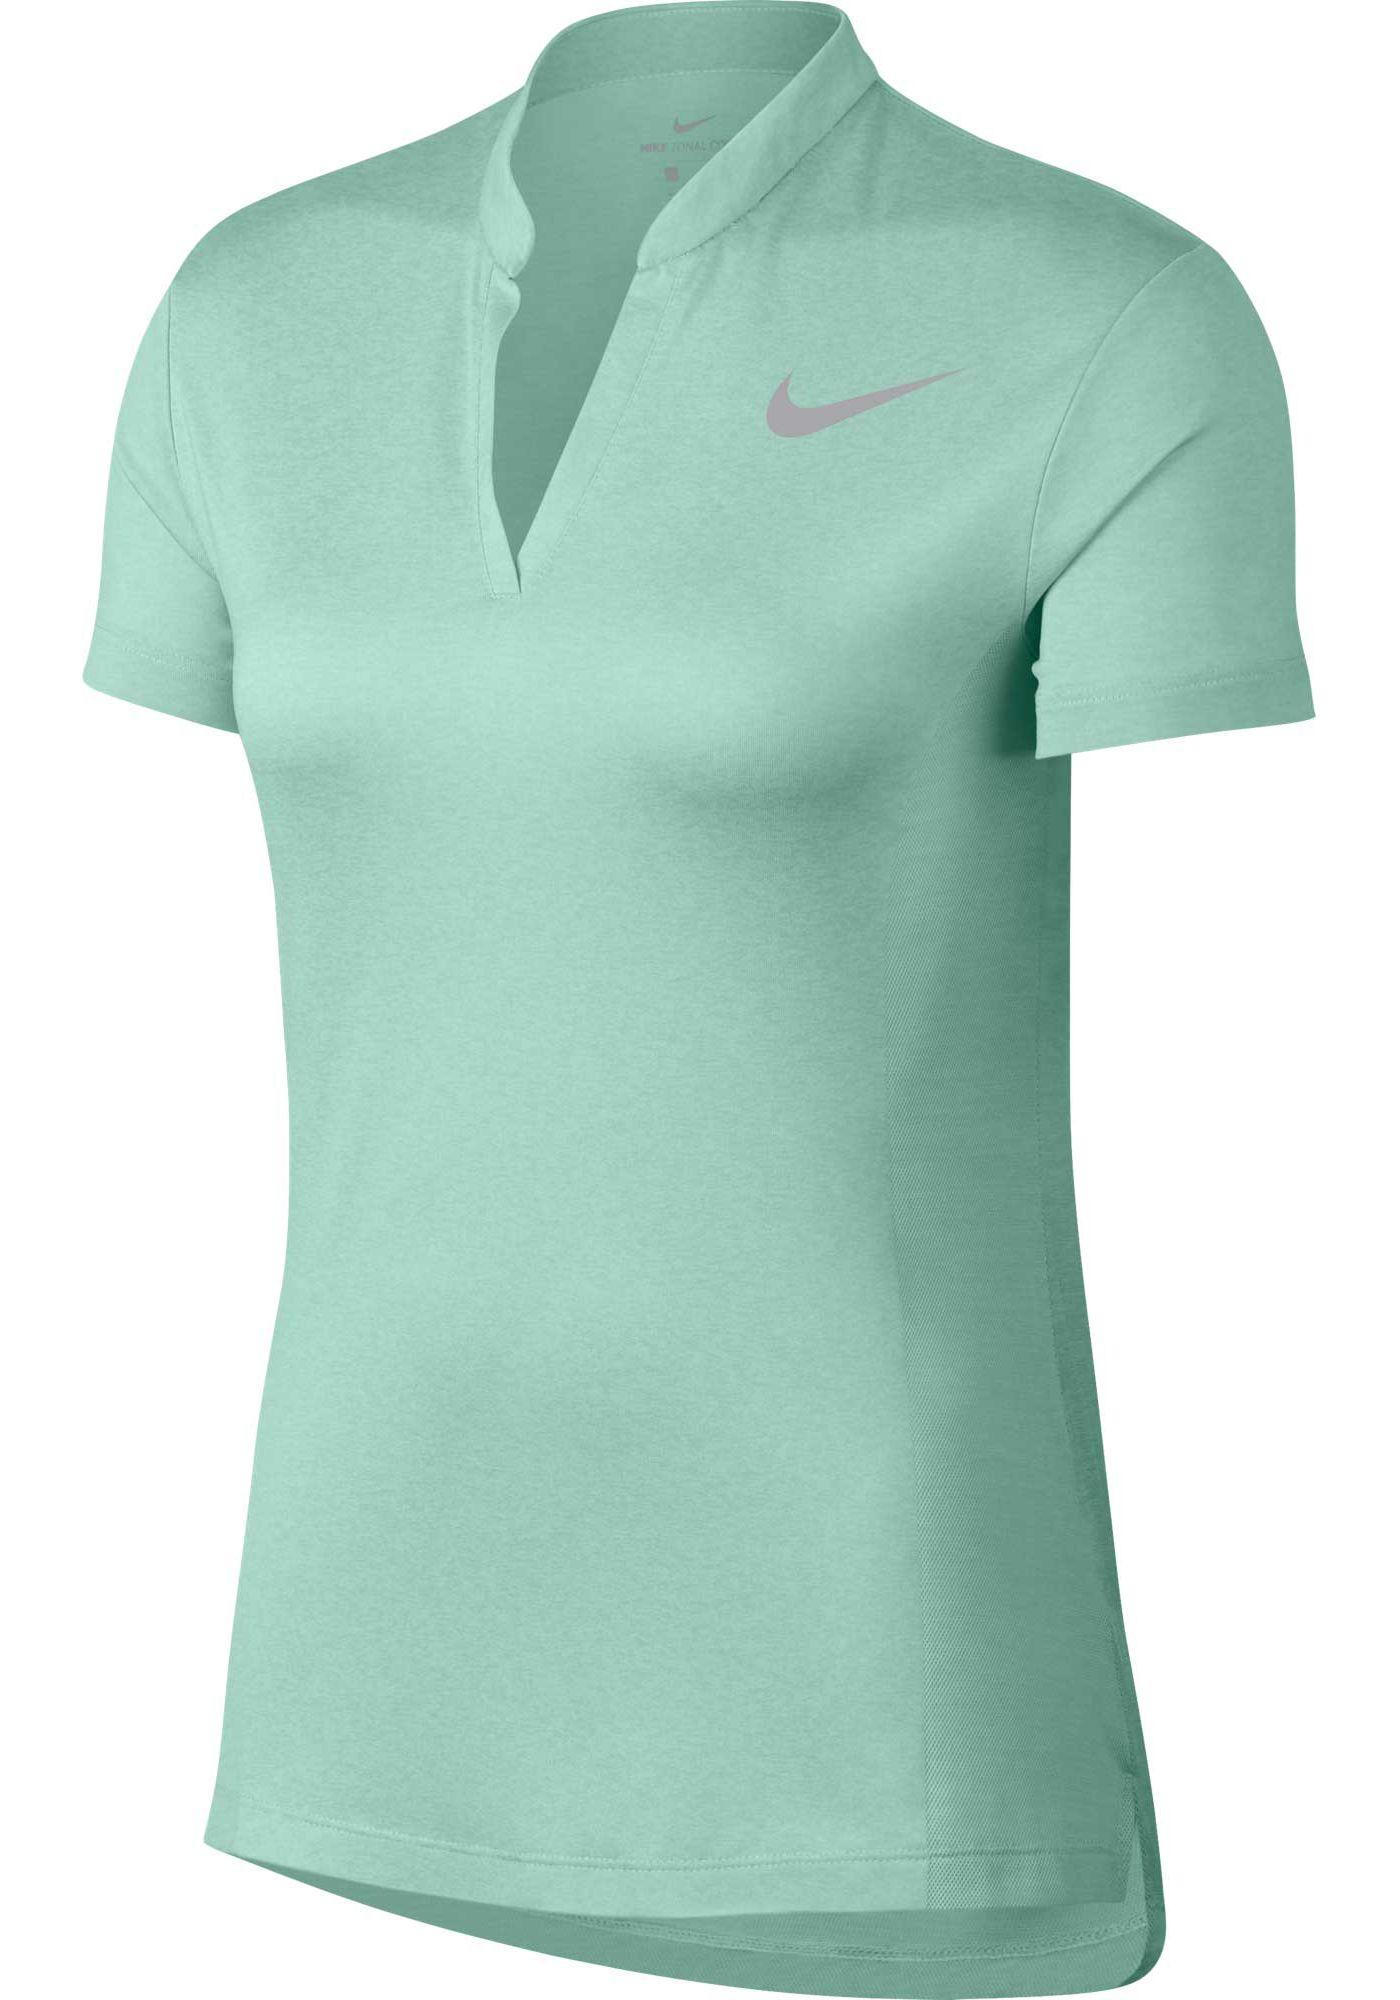 Nike Women's Short Sleeve Jacquard Zonal Cooling Golf Polo